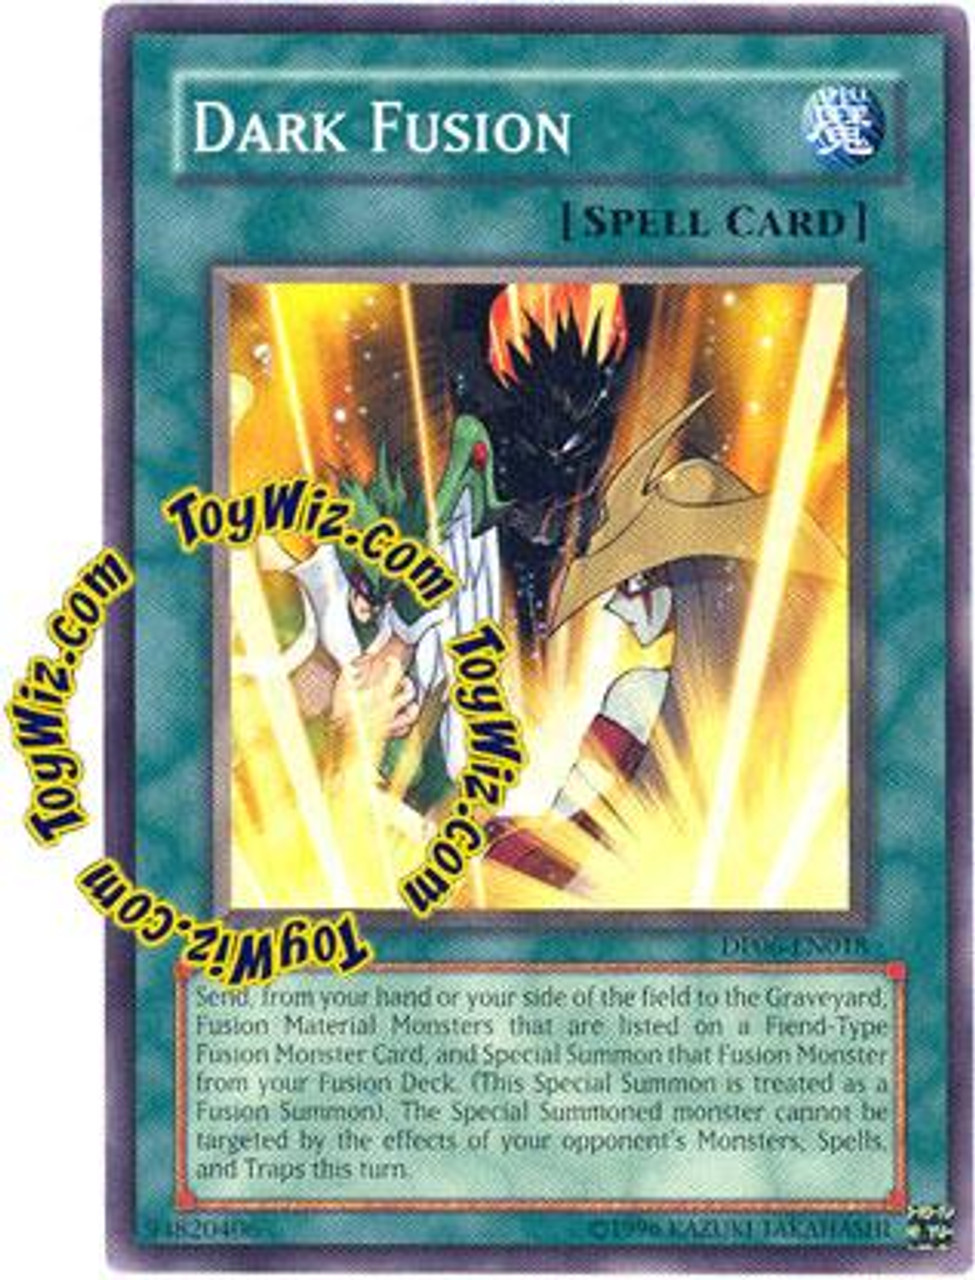 YuGiOh GX Duelist Pack Jaden Yuki 3 Common Dark Fusion DP06-EN018